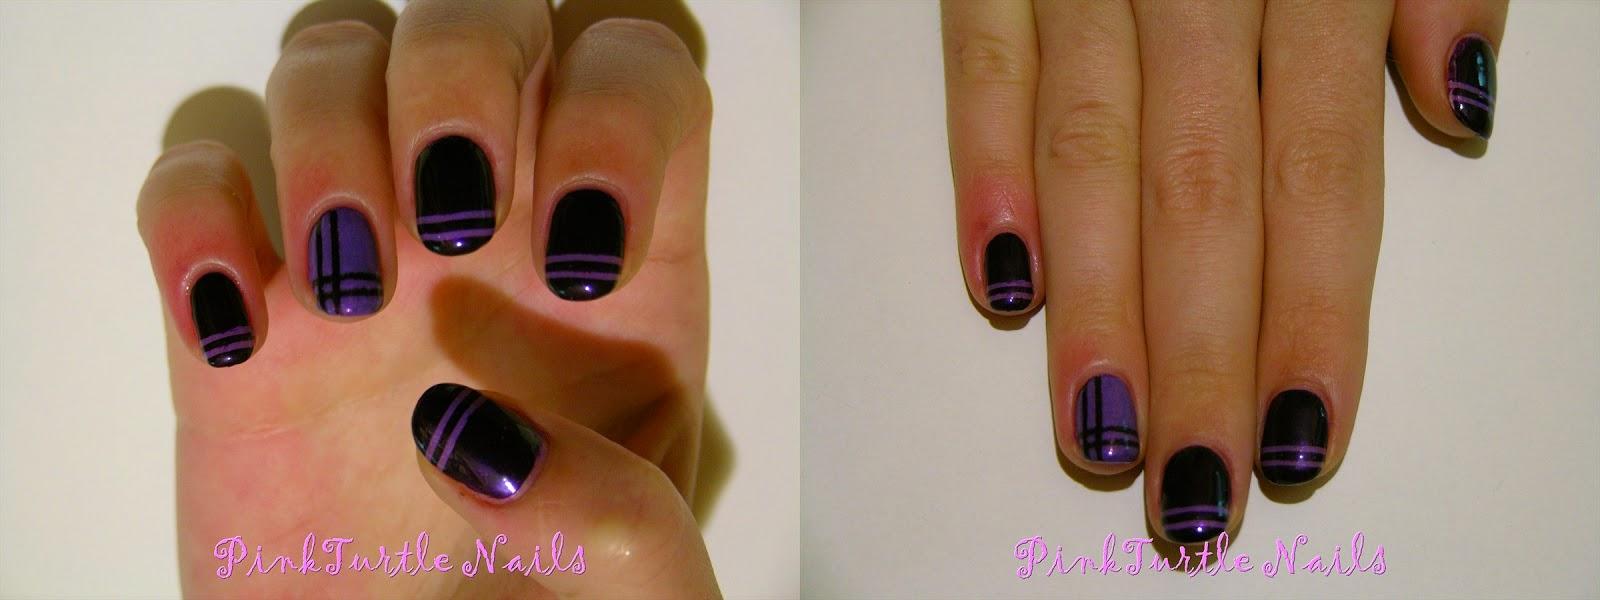 http://pinkturtlenails.blogspot.com.es/2015/03/reto-31-dias-violeta.html